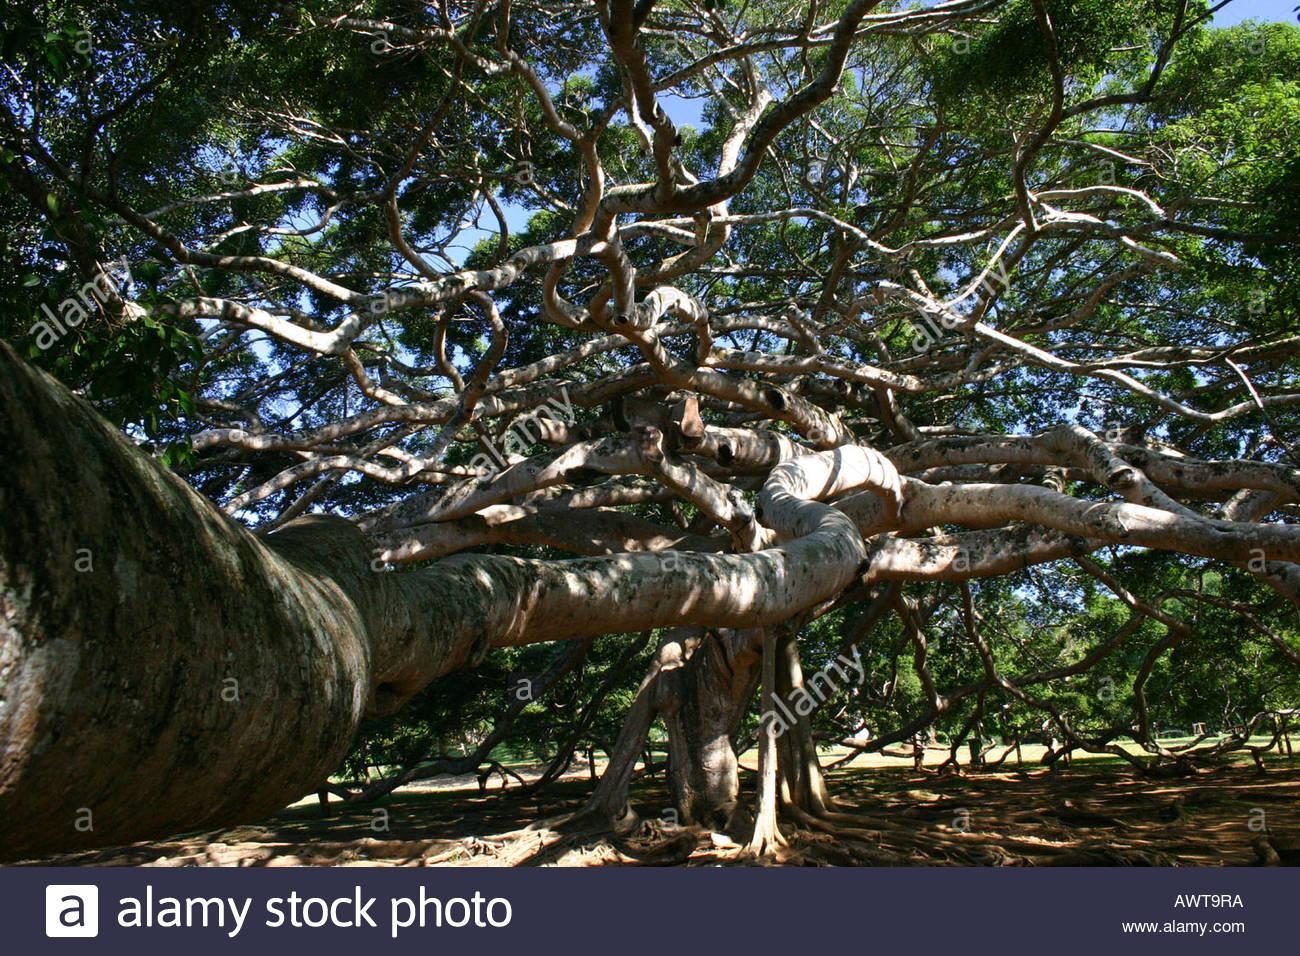 gro en feigenbaum im botanischen garten peradeniya sri lanka asien stockfoto bild 9513785 alamy. Black Bedroom Furniture Sets. Home Design Ideas